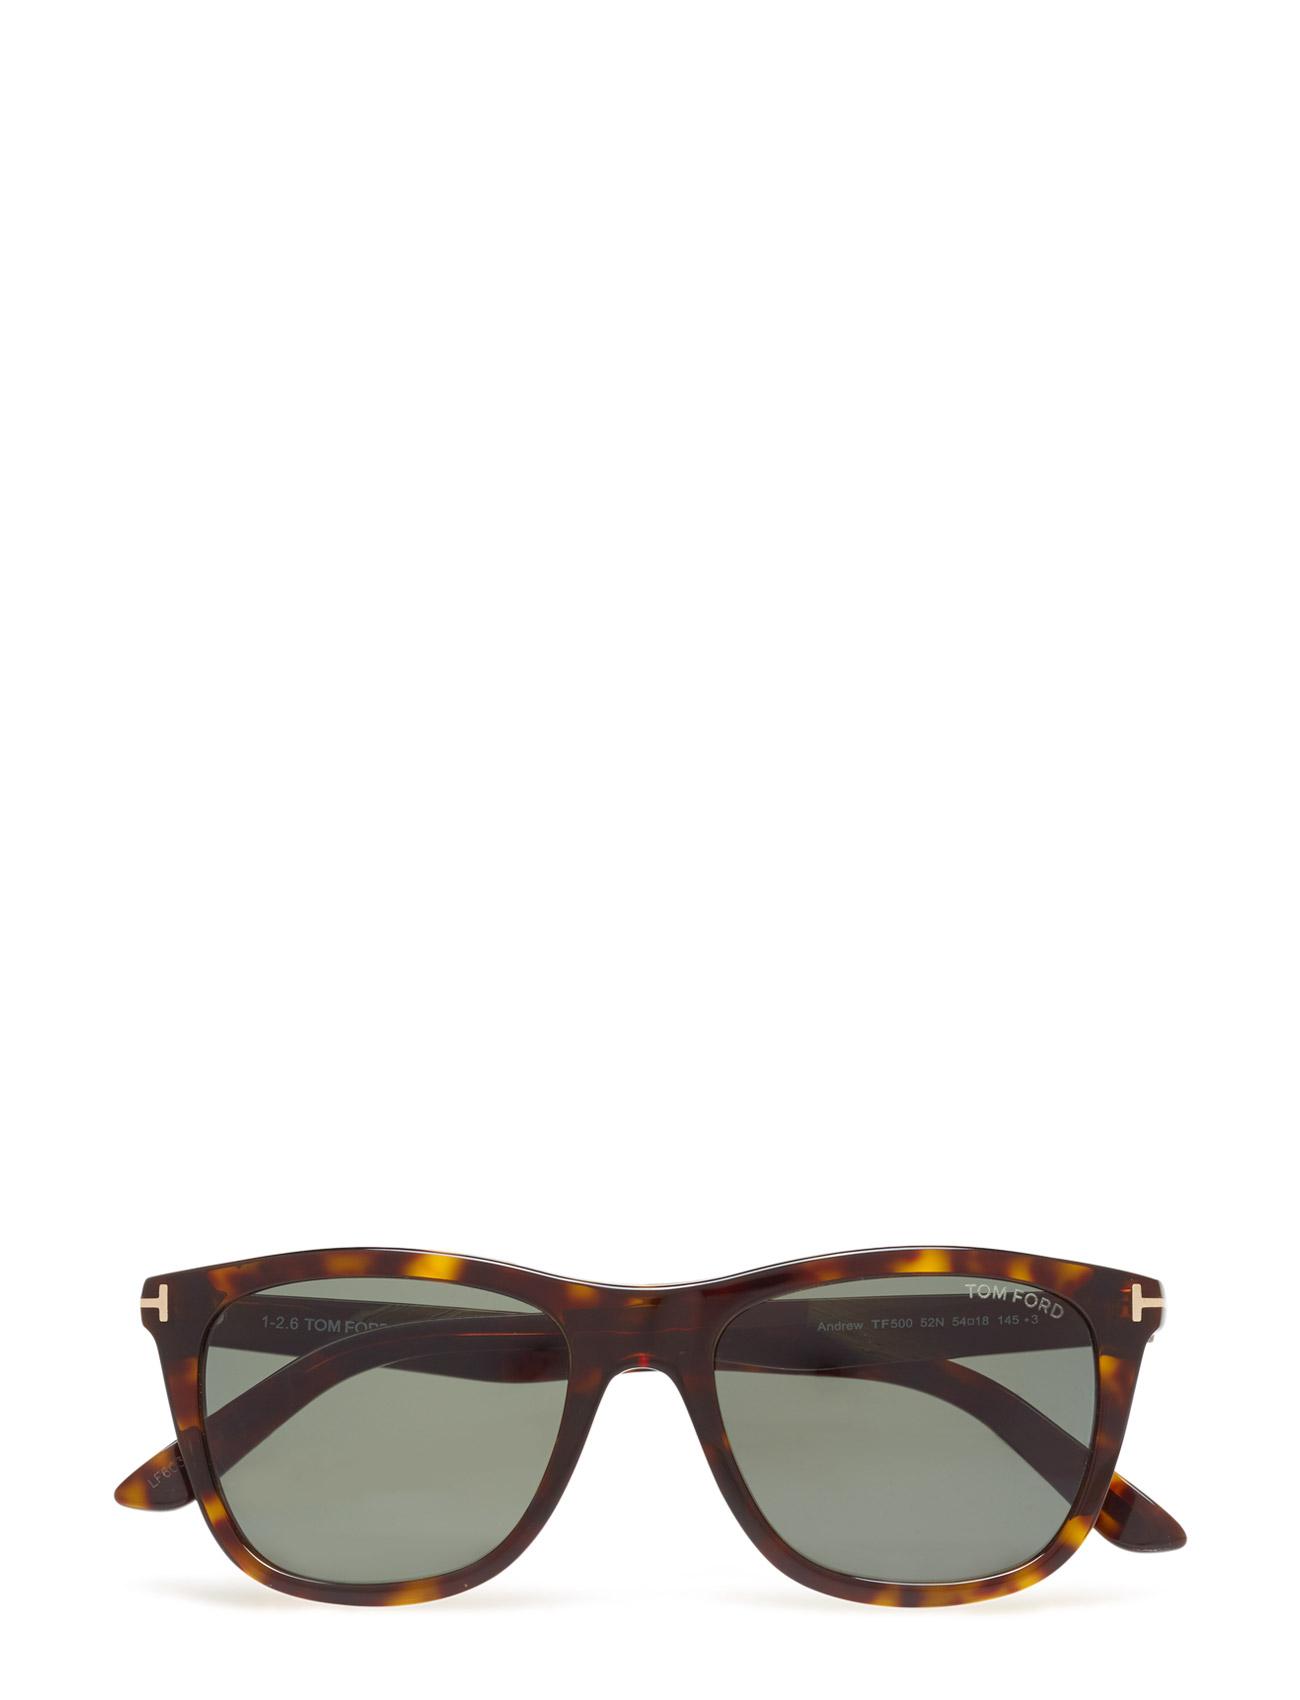 2e15b2dae0 Tom Ford Sunglasses Tom Ford Andrew (52n Dark Havana   Green)